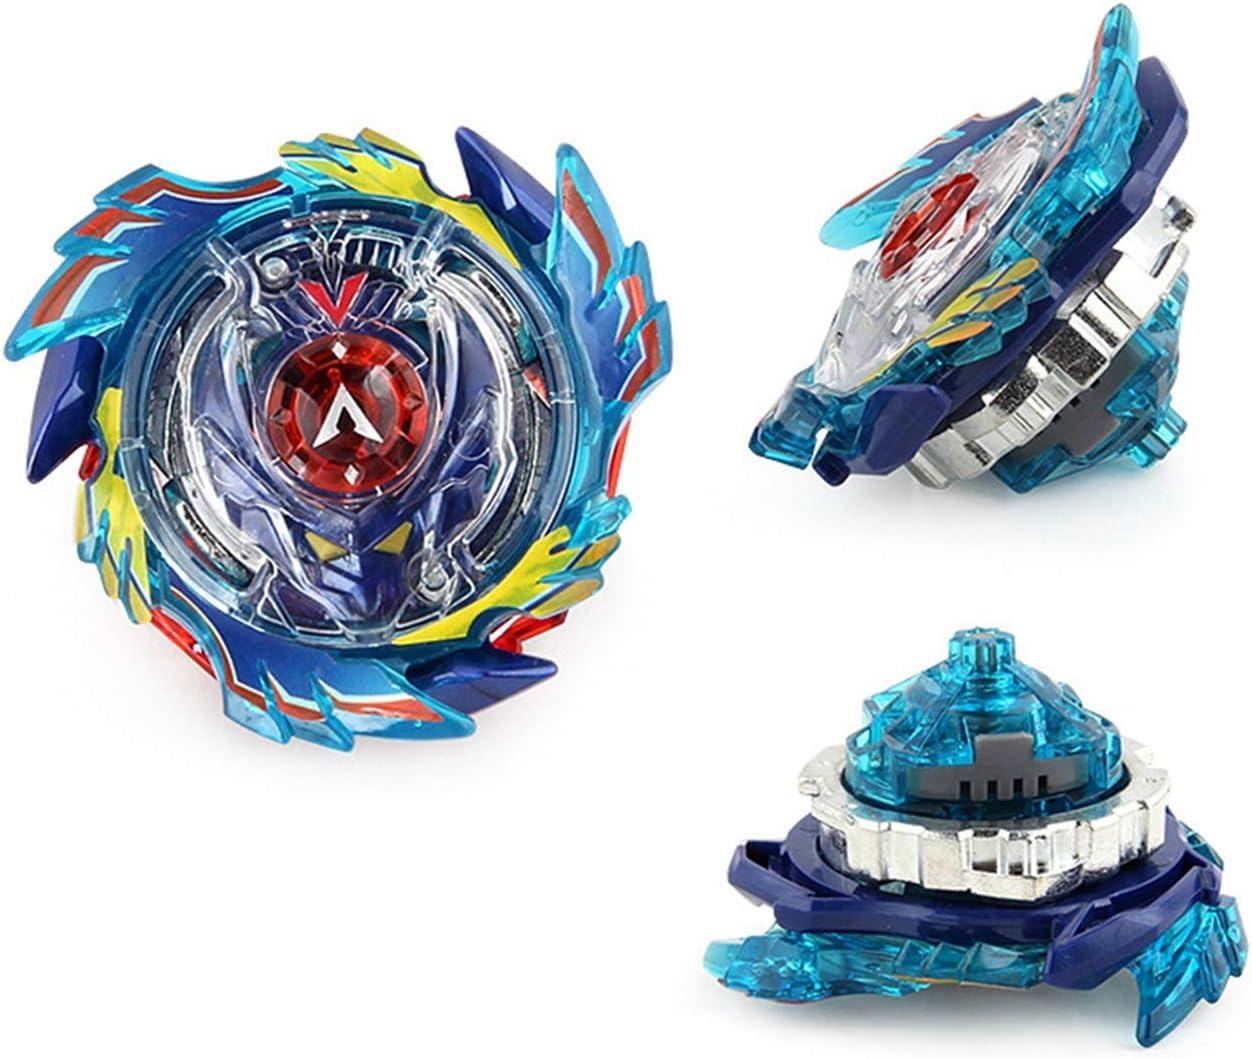 Beyblade Burst B-73 Starter God Valkyrie.6V.Rb Legend Spriggan Toy Gift Fun Kids